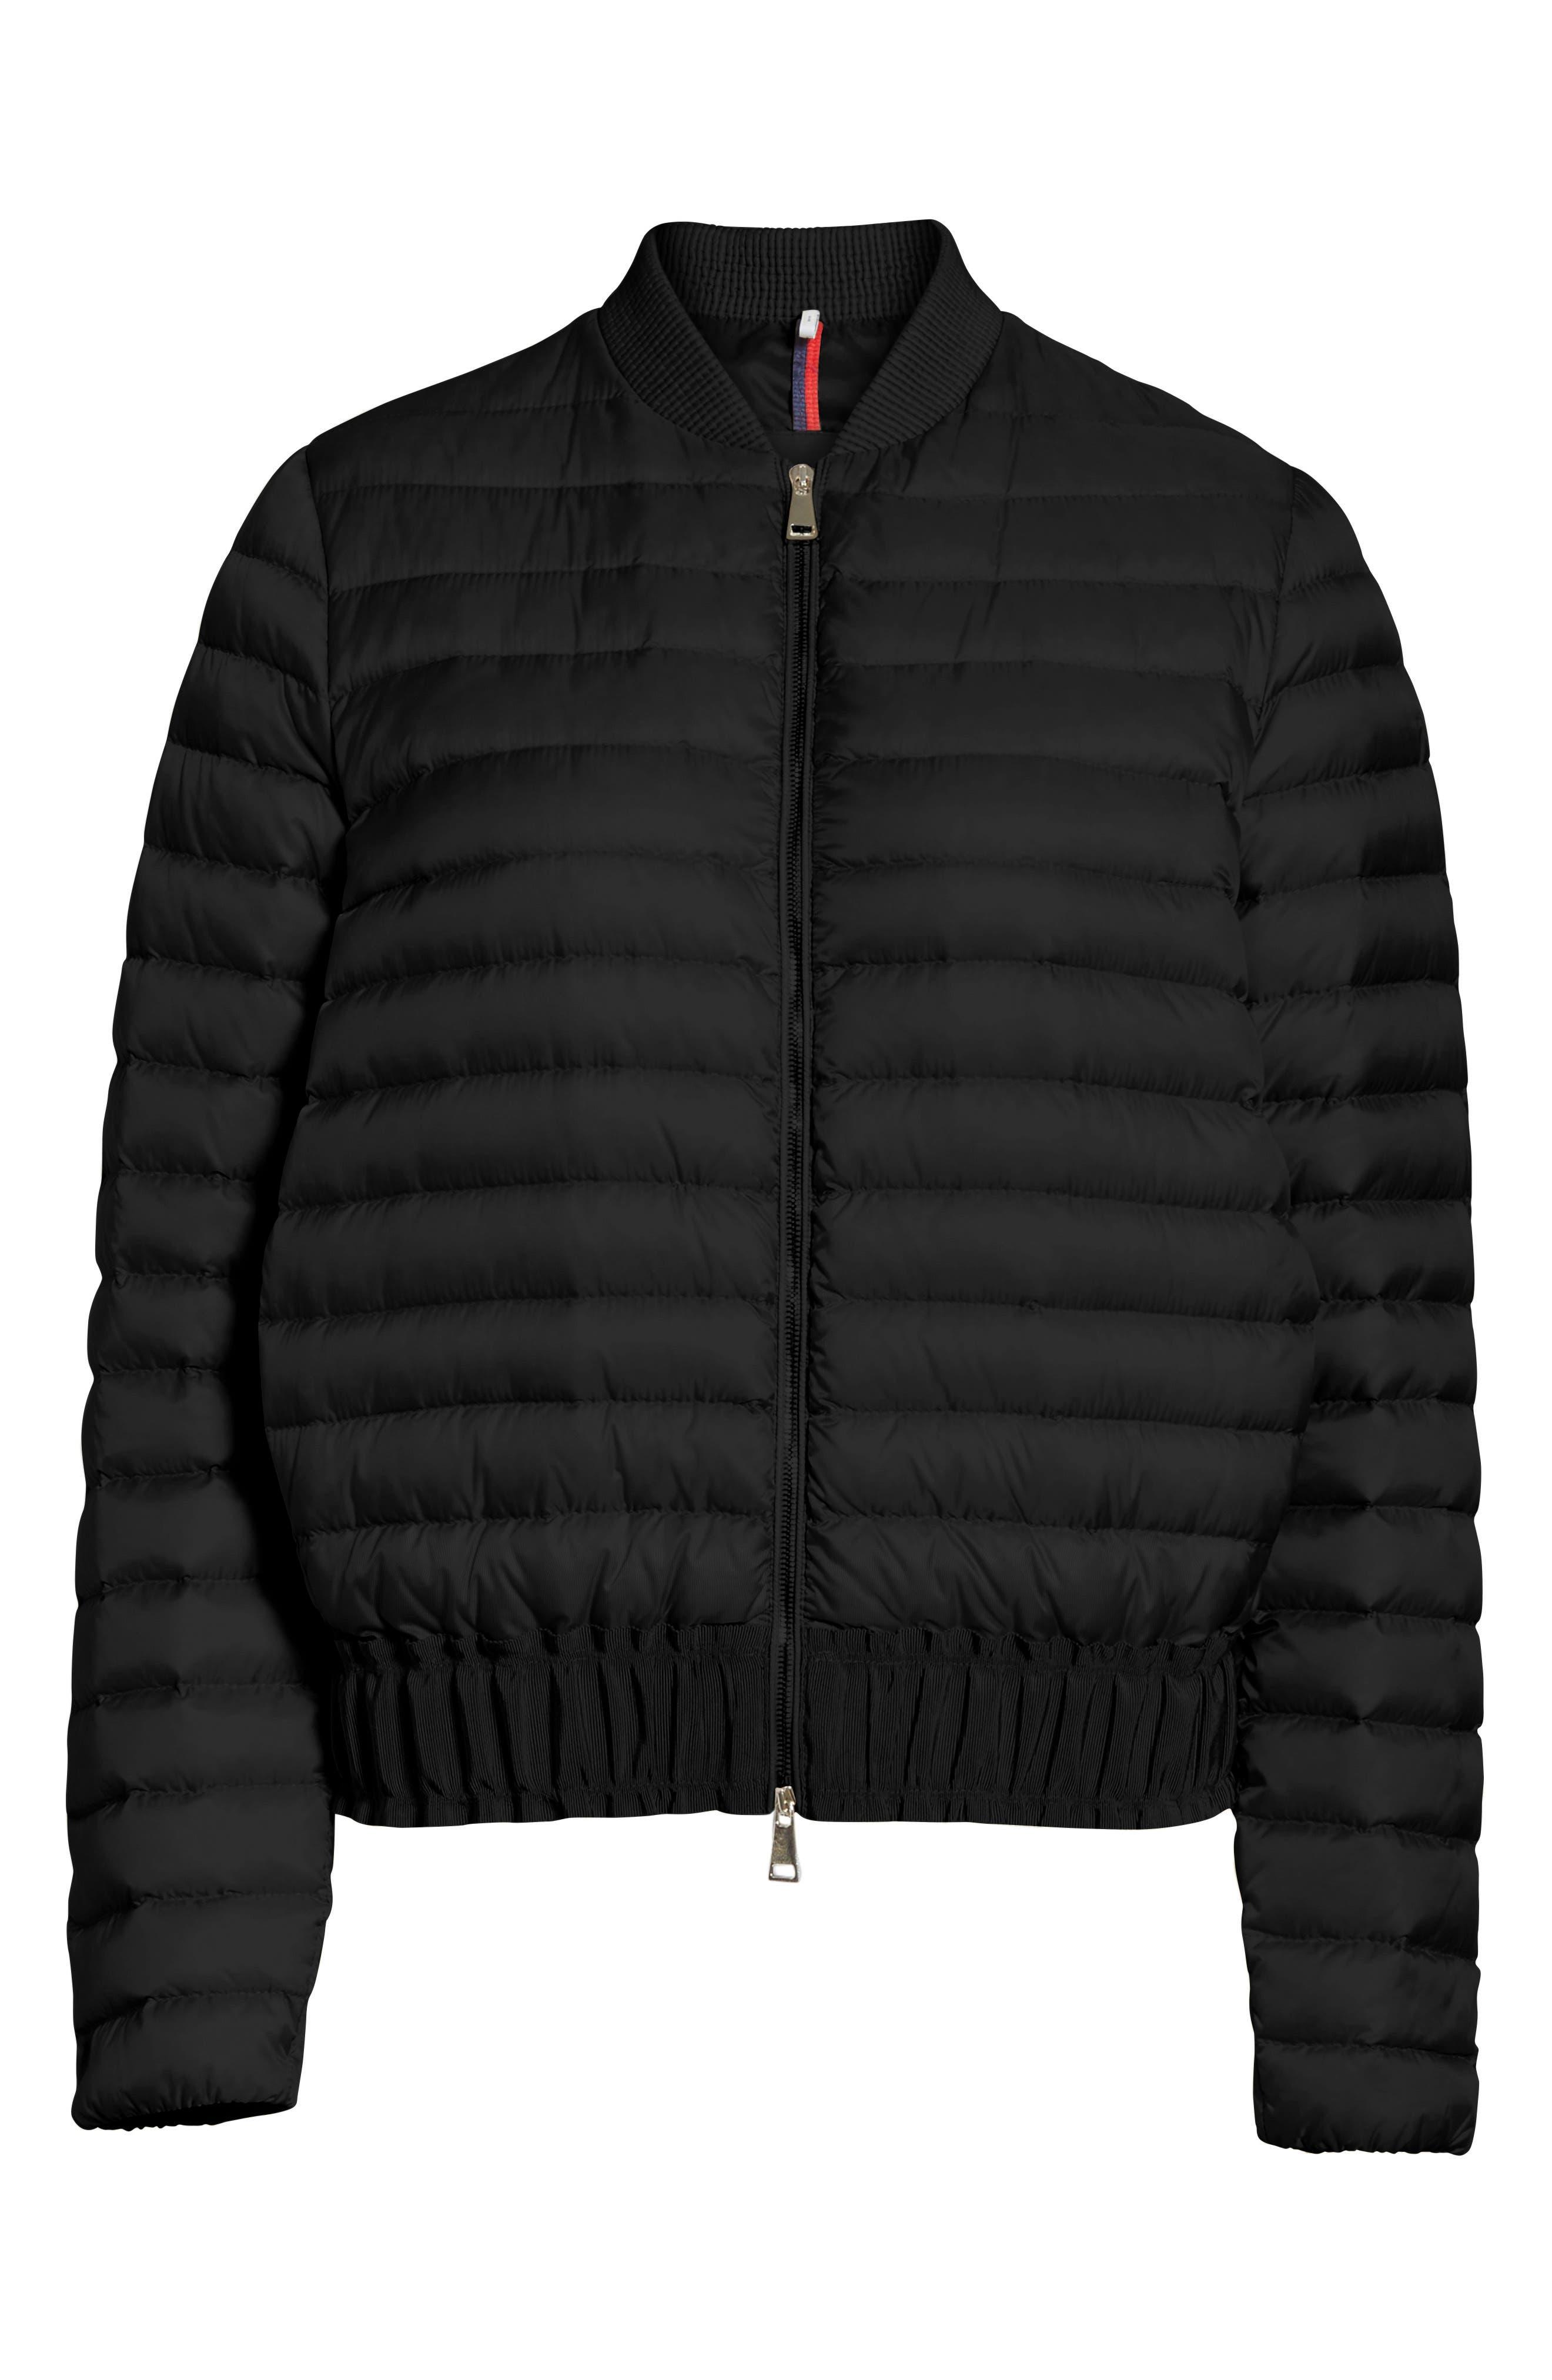 Barytine Quilted Bomber Jacket,                             Alternate thumbnail 5, color,                             BLACK